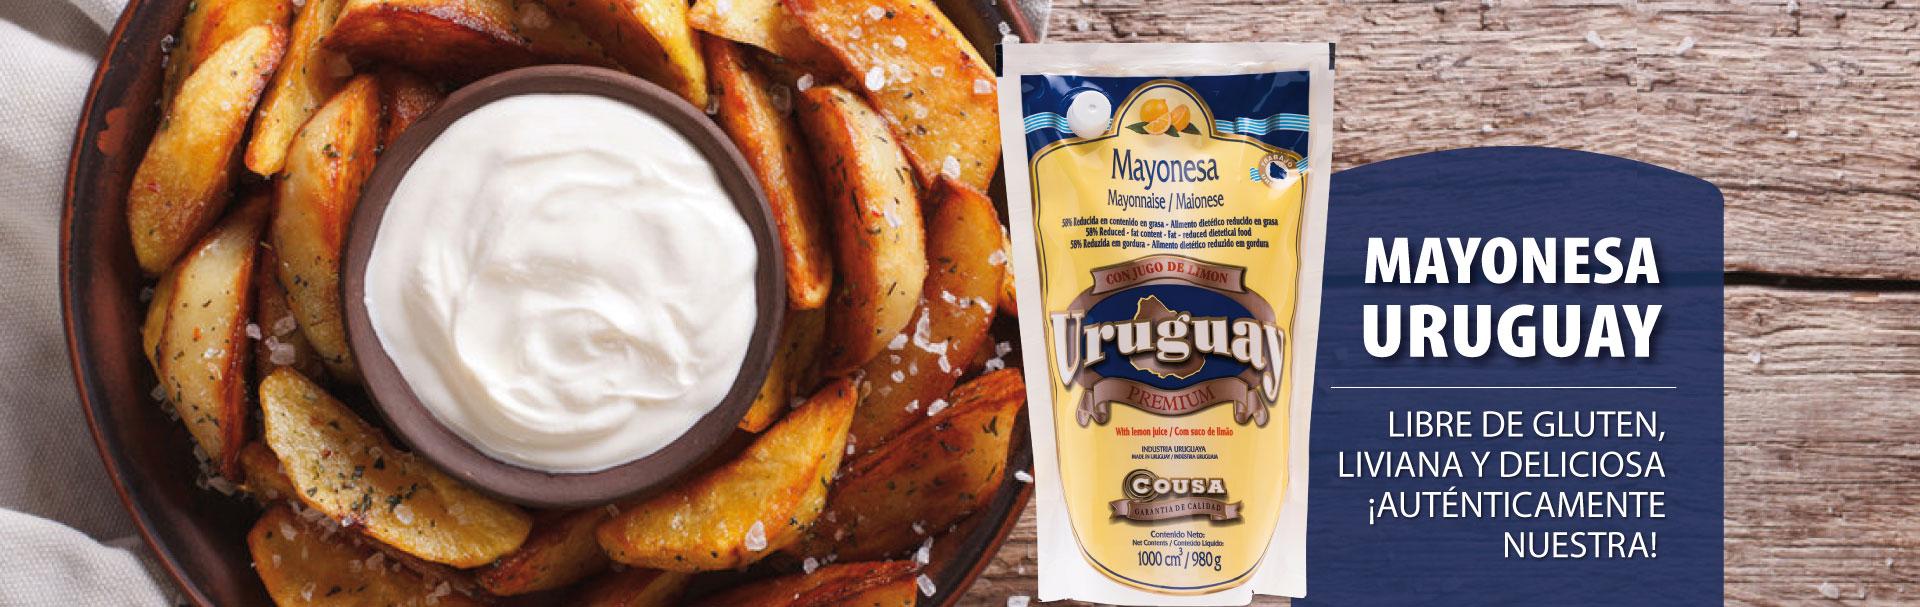 sachet de mayonesa uruguay